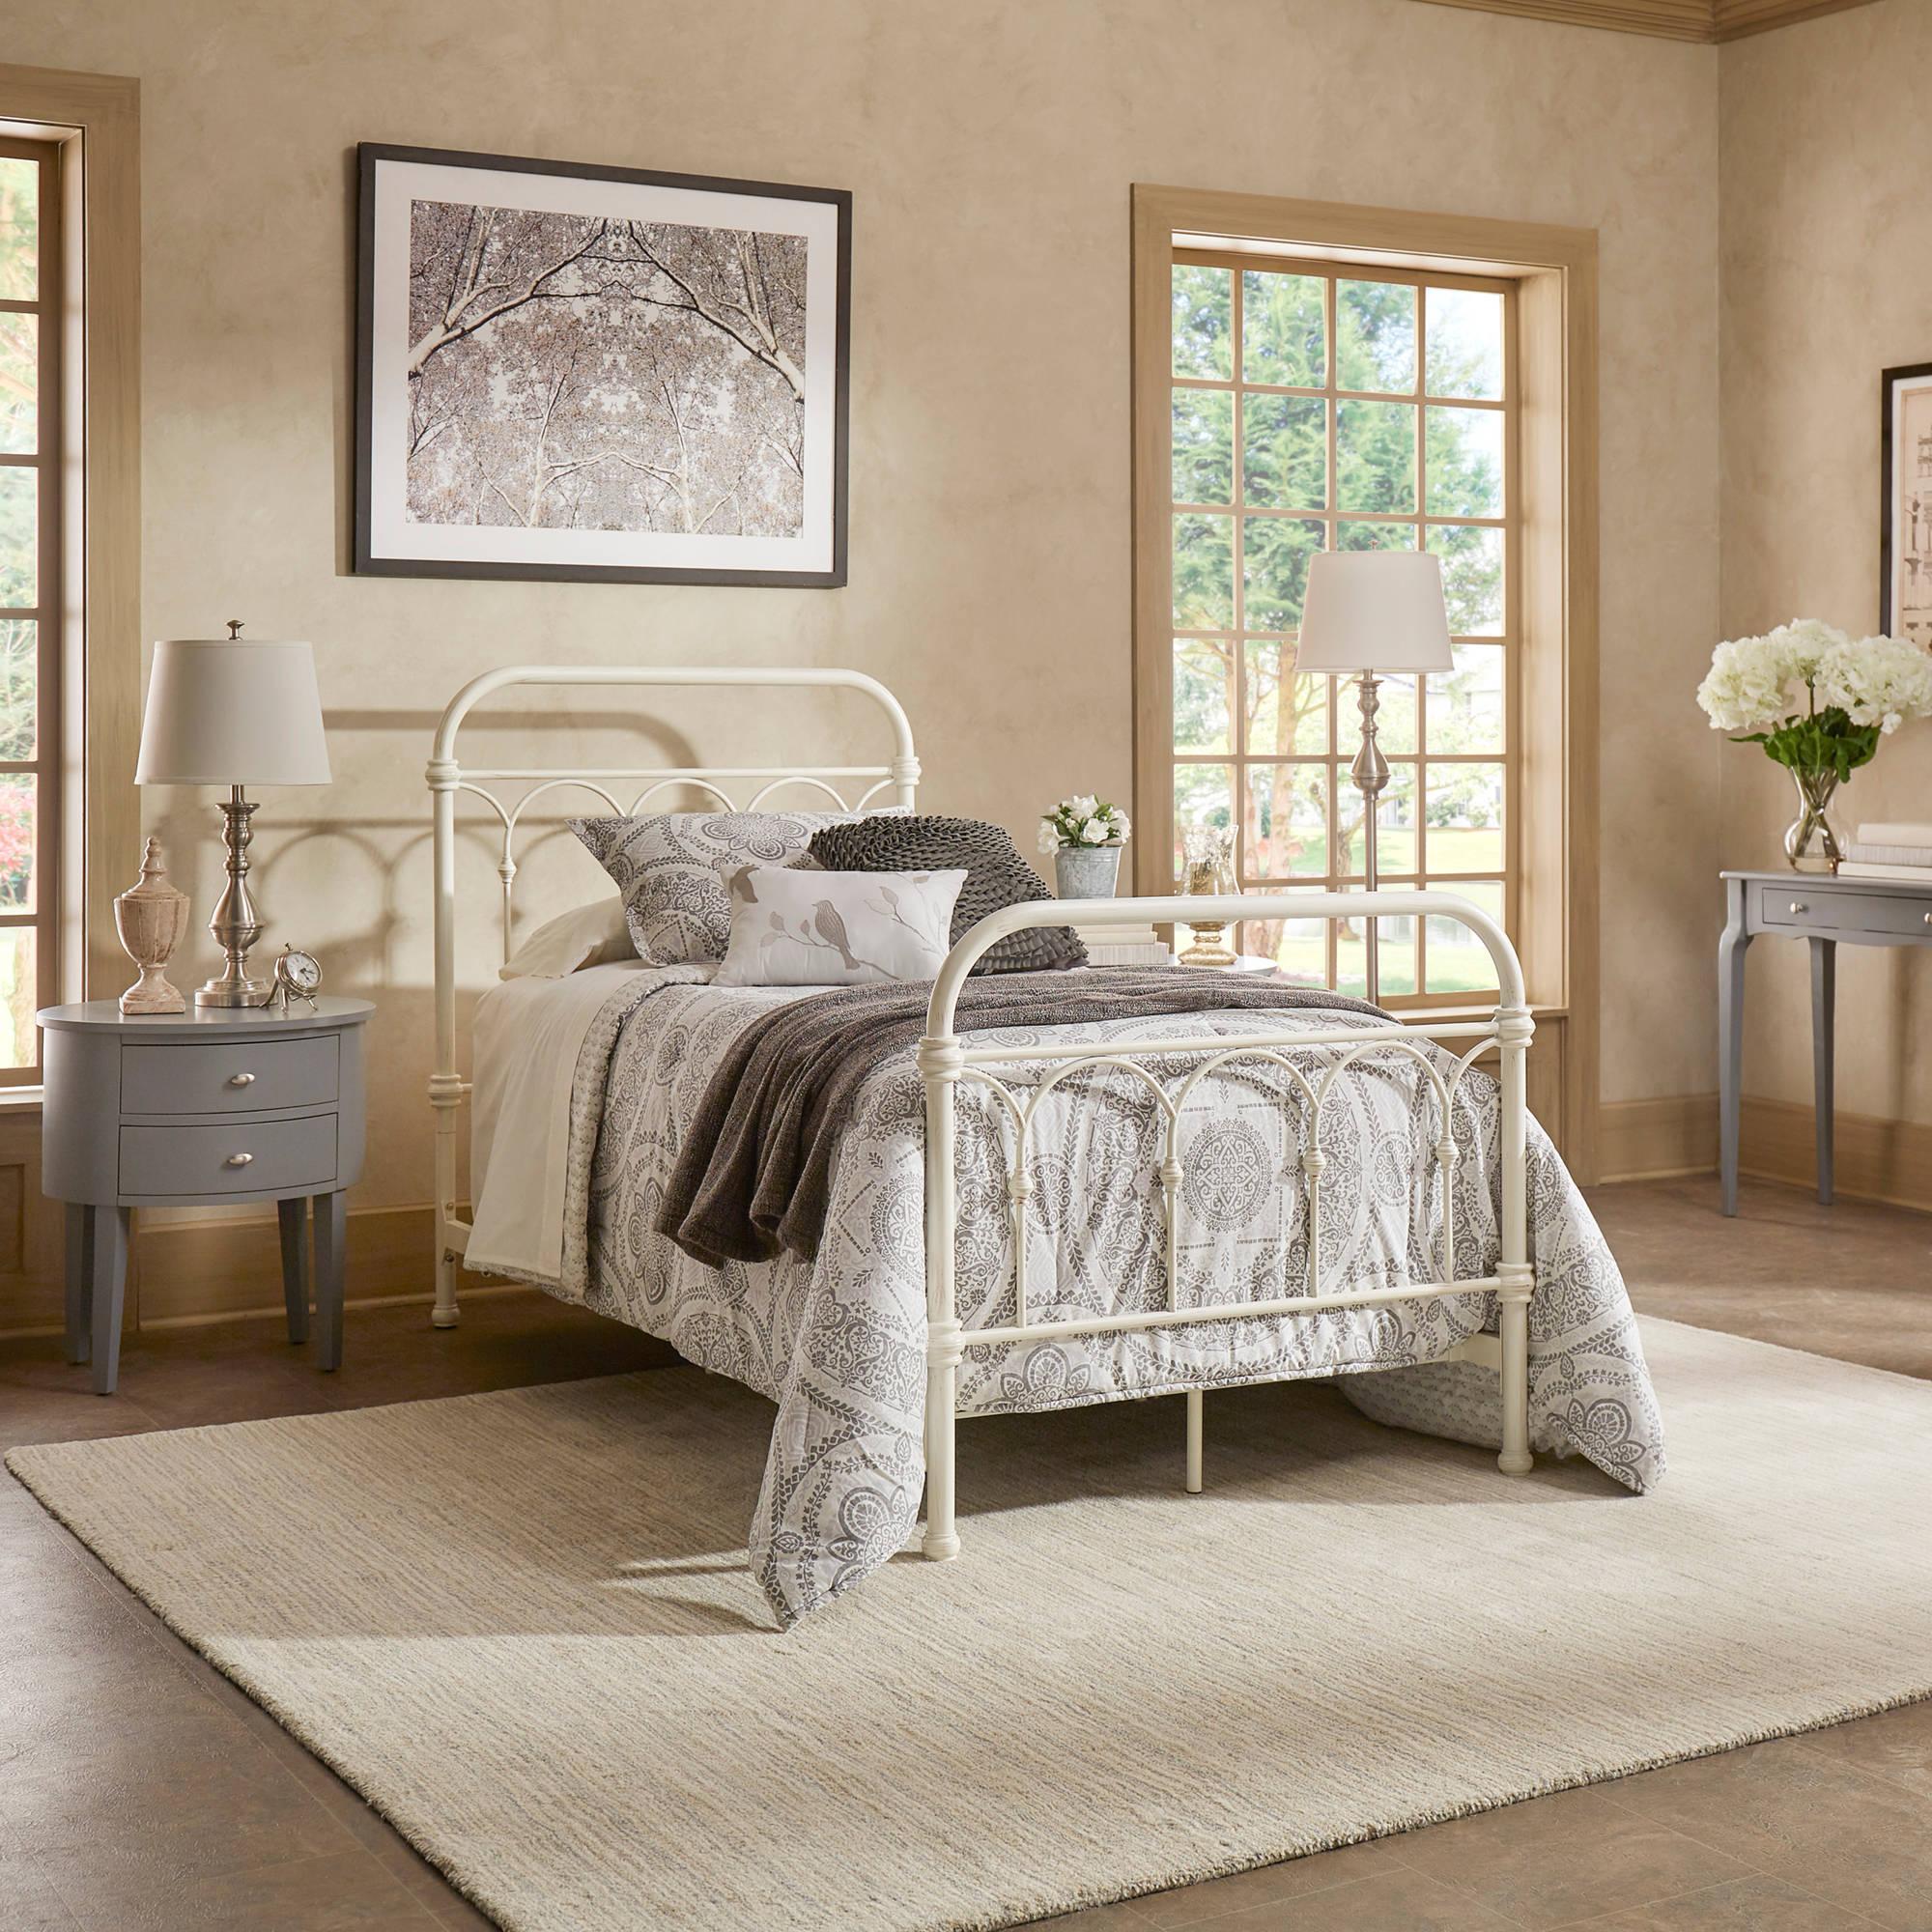 Chelsea Lane Abingdon Metal Bed, Multiple Sizes